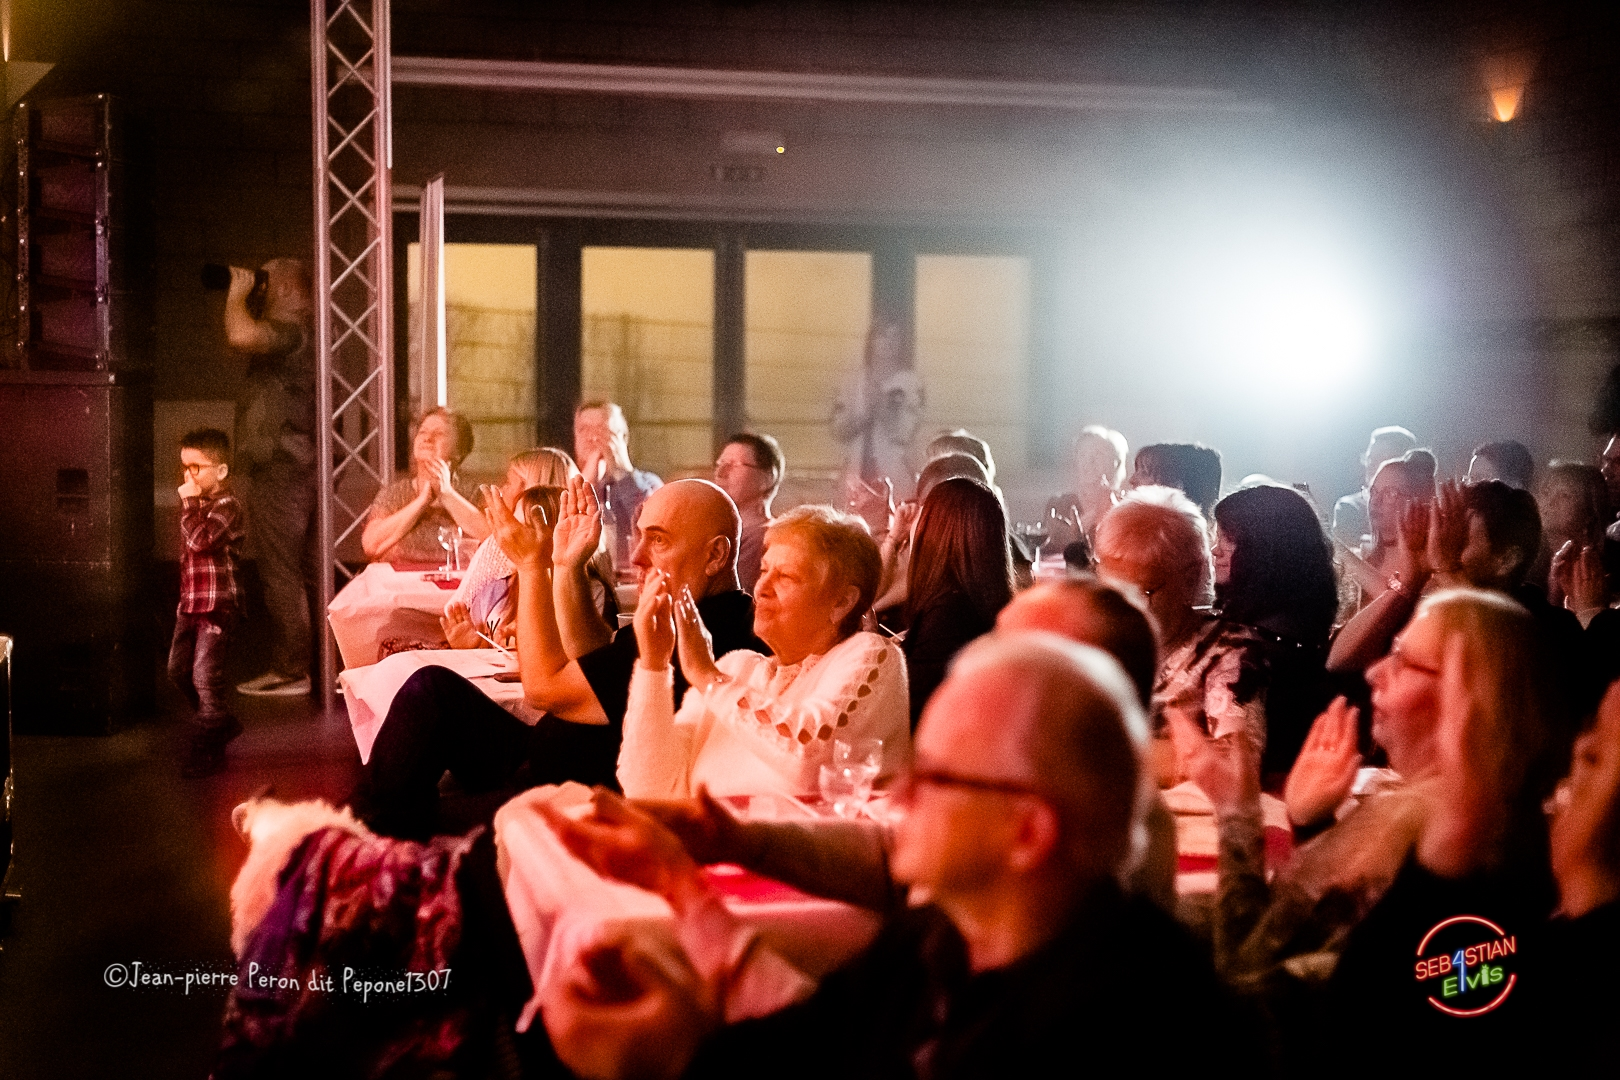 sebastian-for-elvis-pepone1307-centre-culturel-rocourt-facebook-31